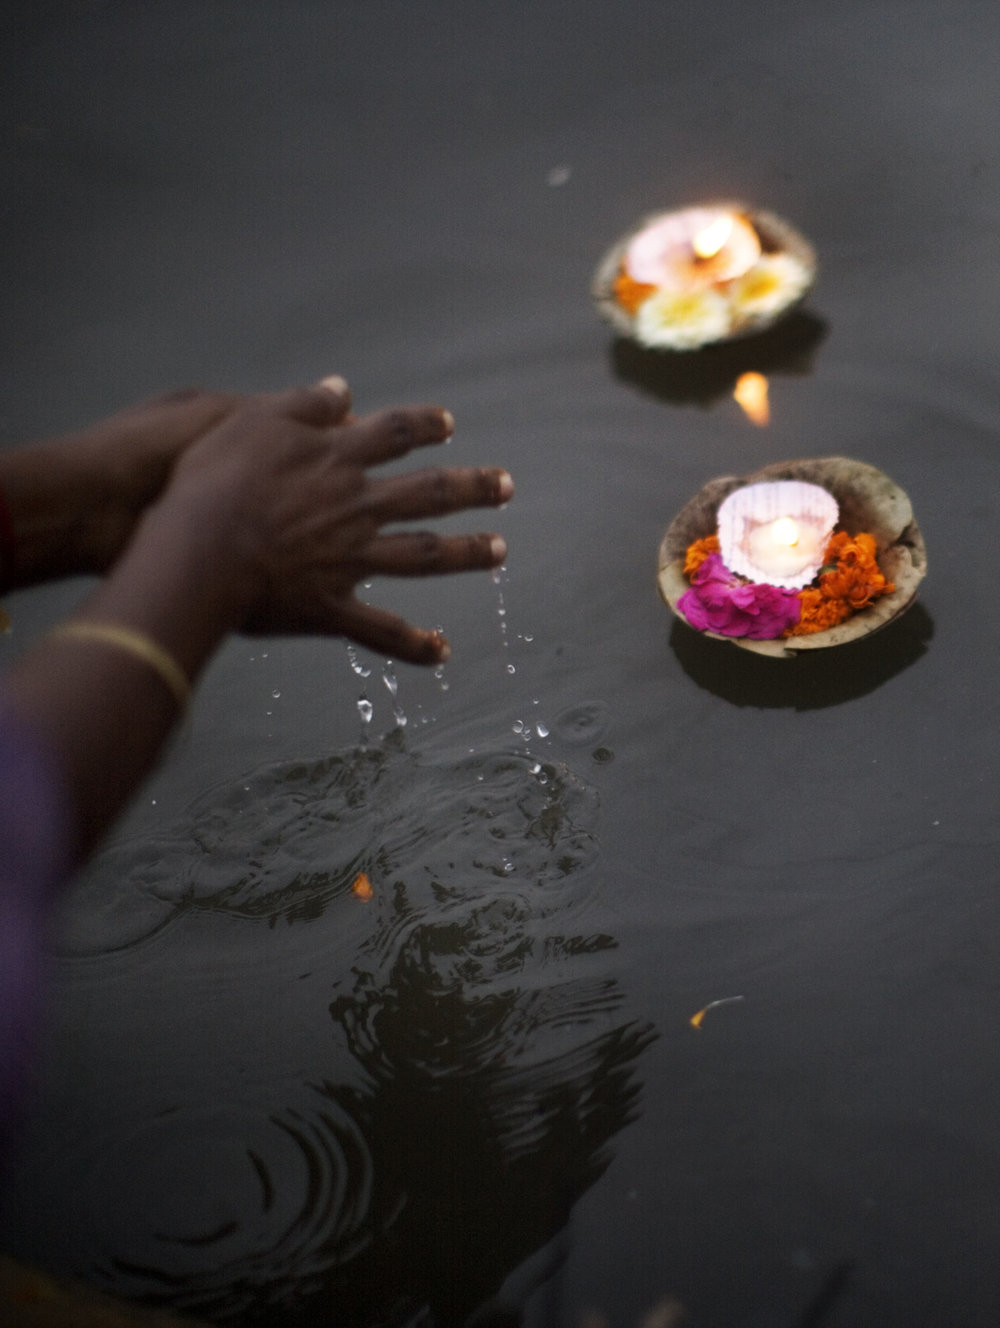 India0713.jpg